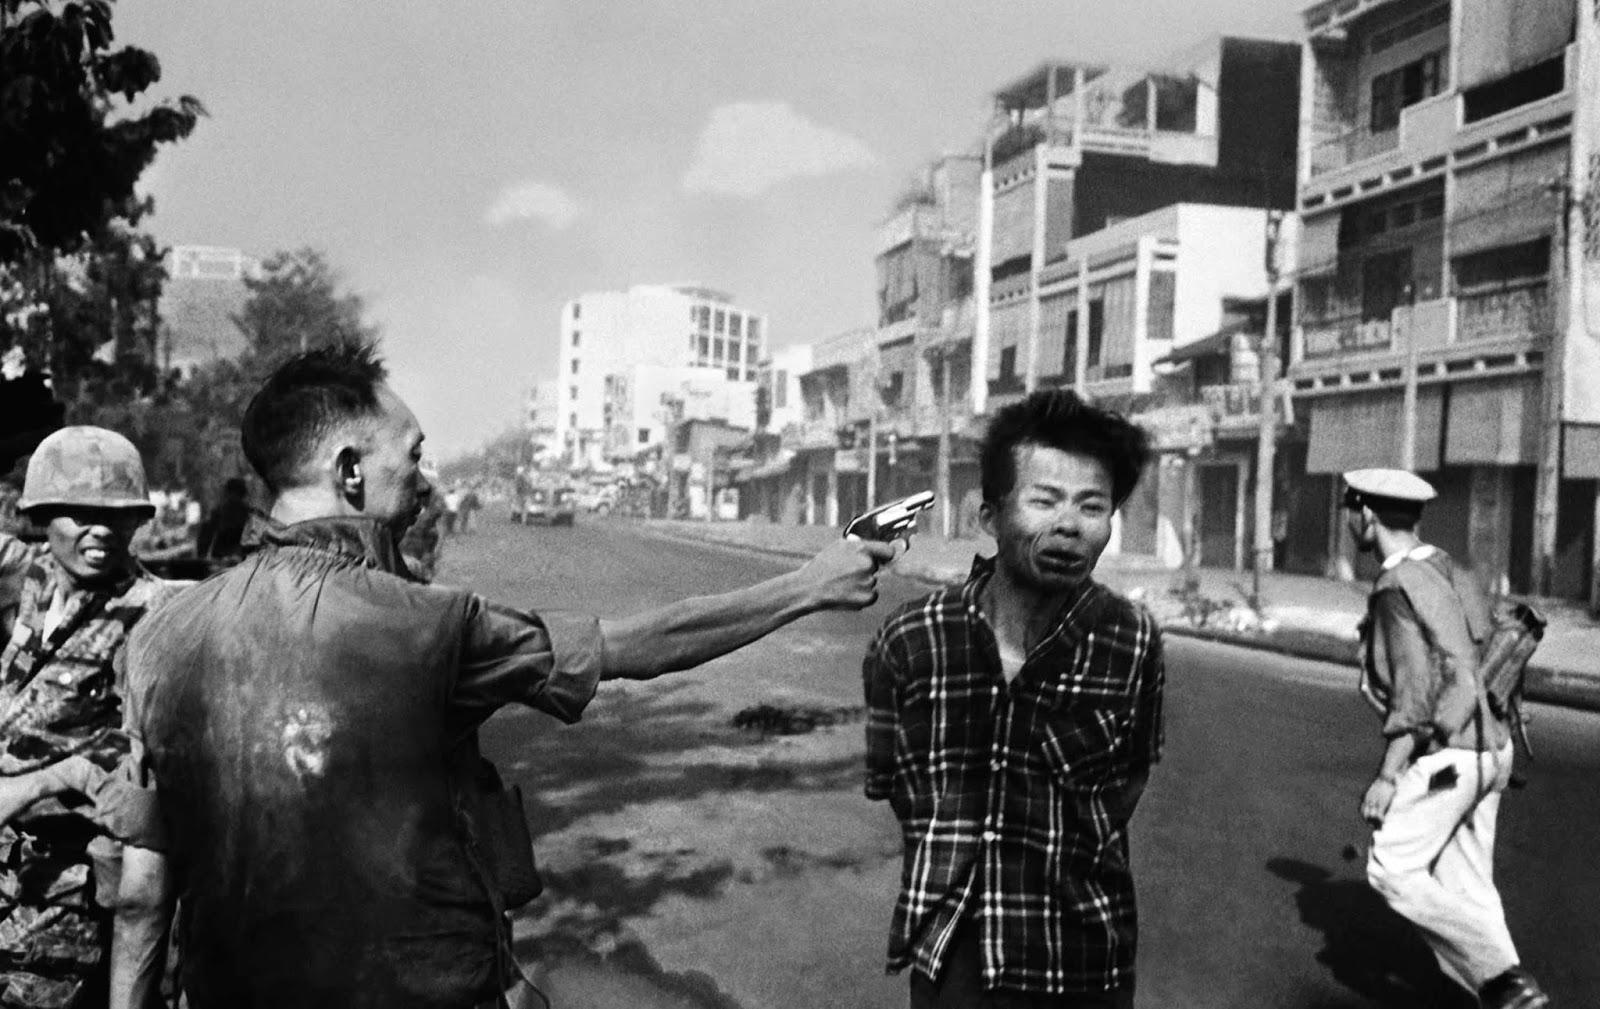 Rough Justice on a Saigon Street - Eddie Adams